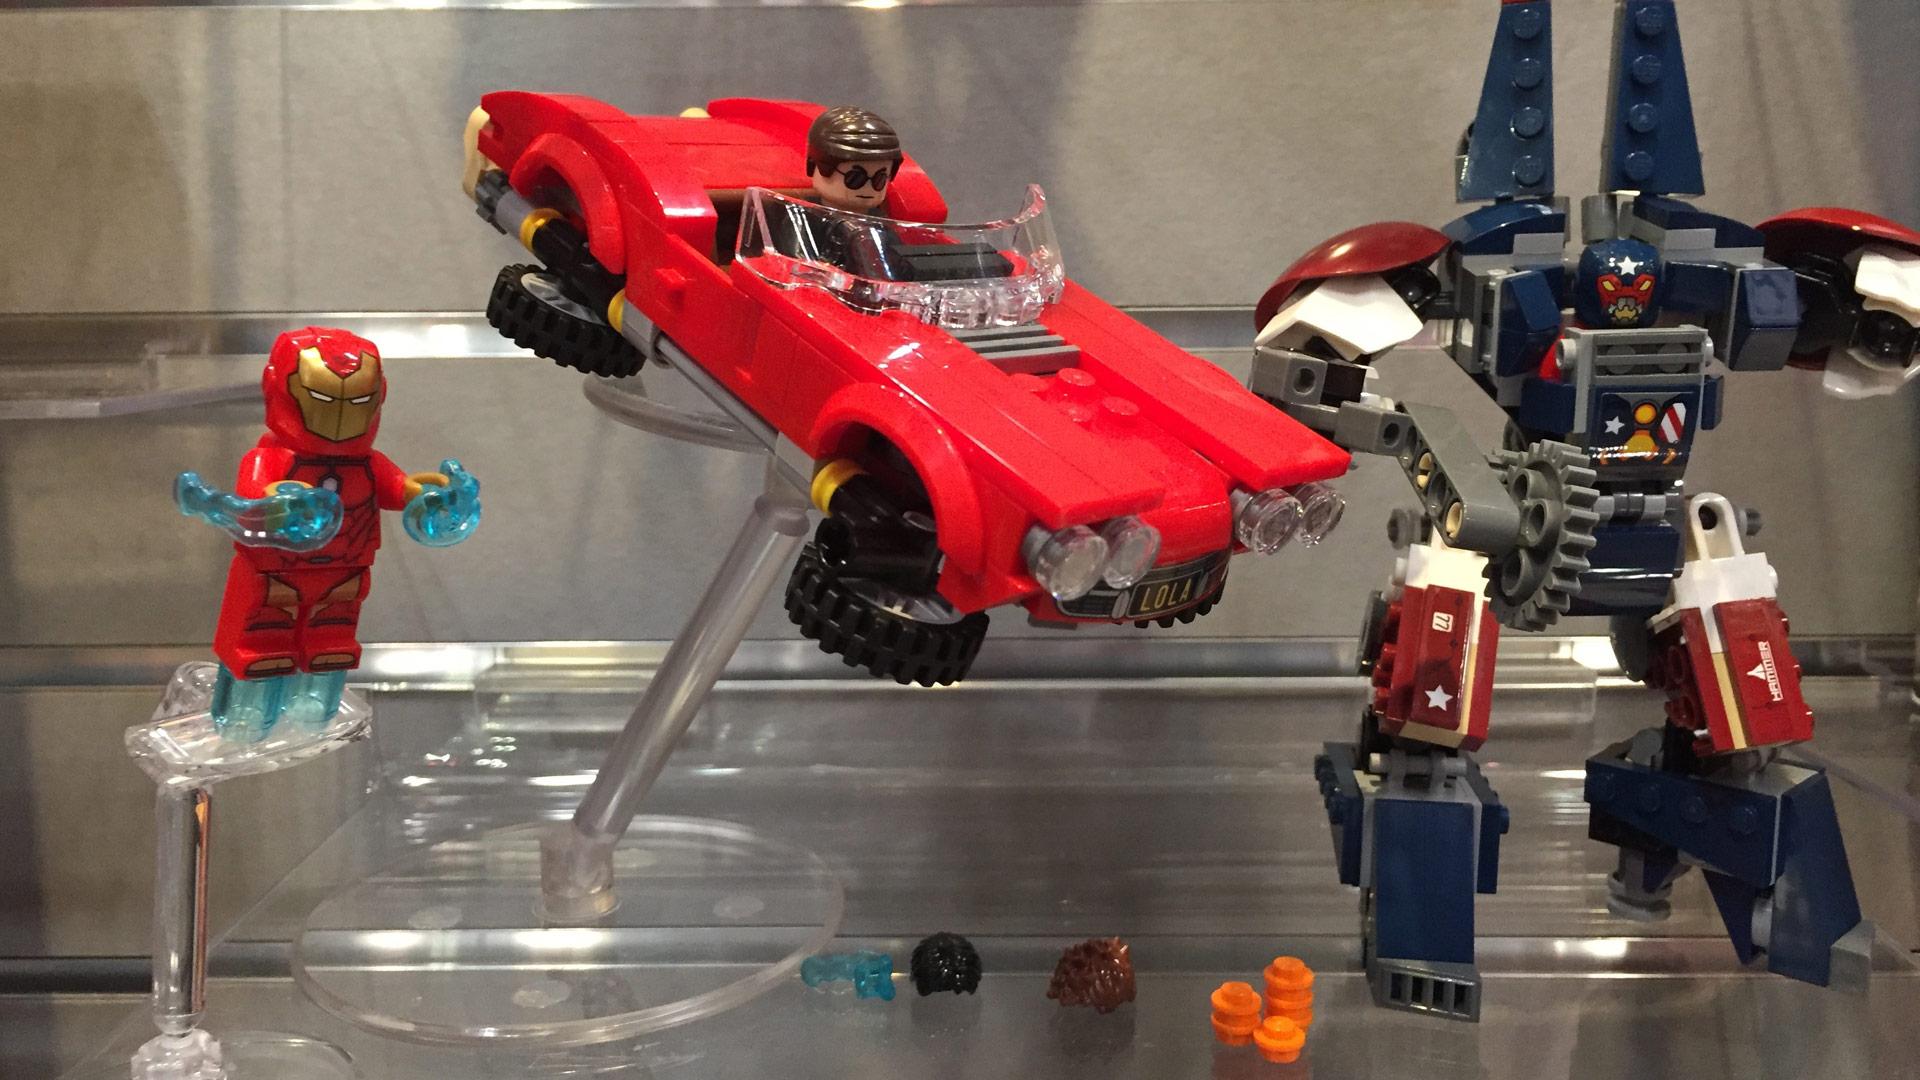 LEGO Marvel Super Heroes Set 76077 Iron Man Steel Detroit Strikes at Toy Fair 2017